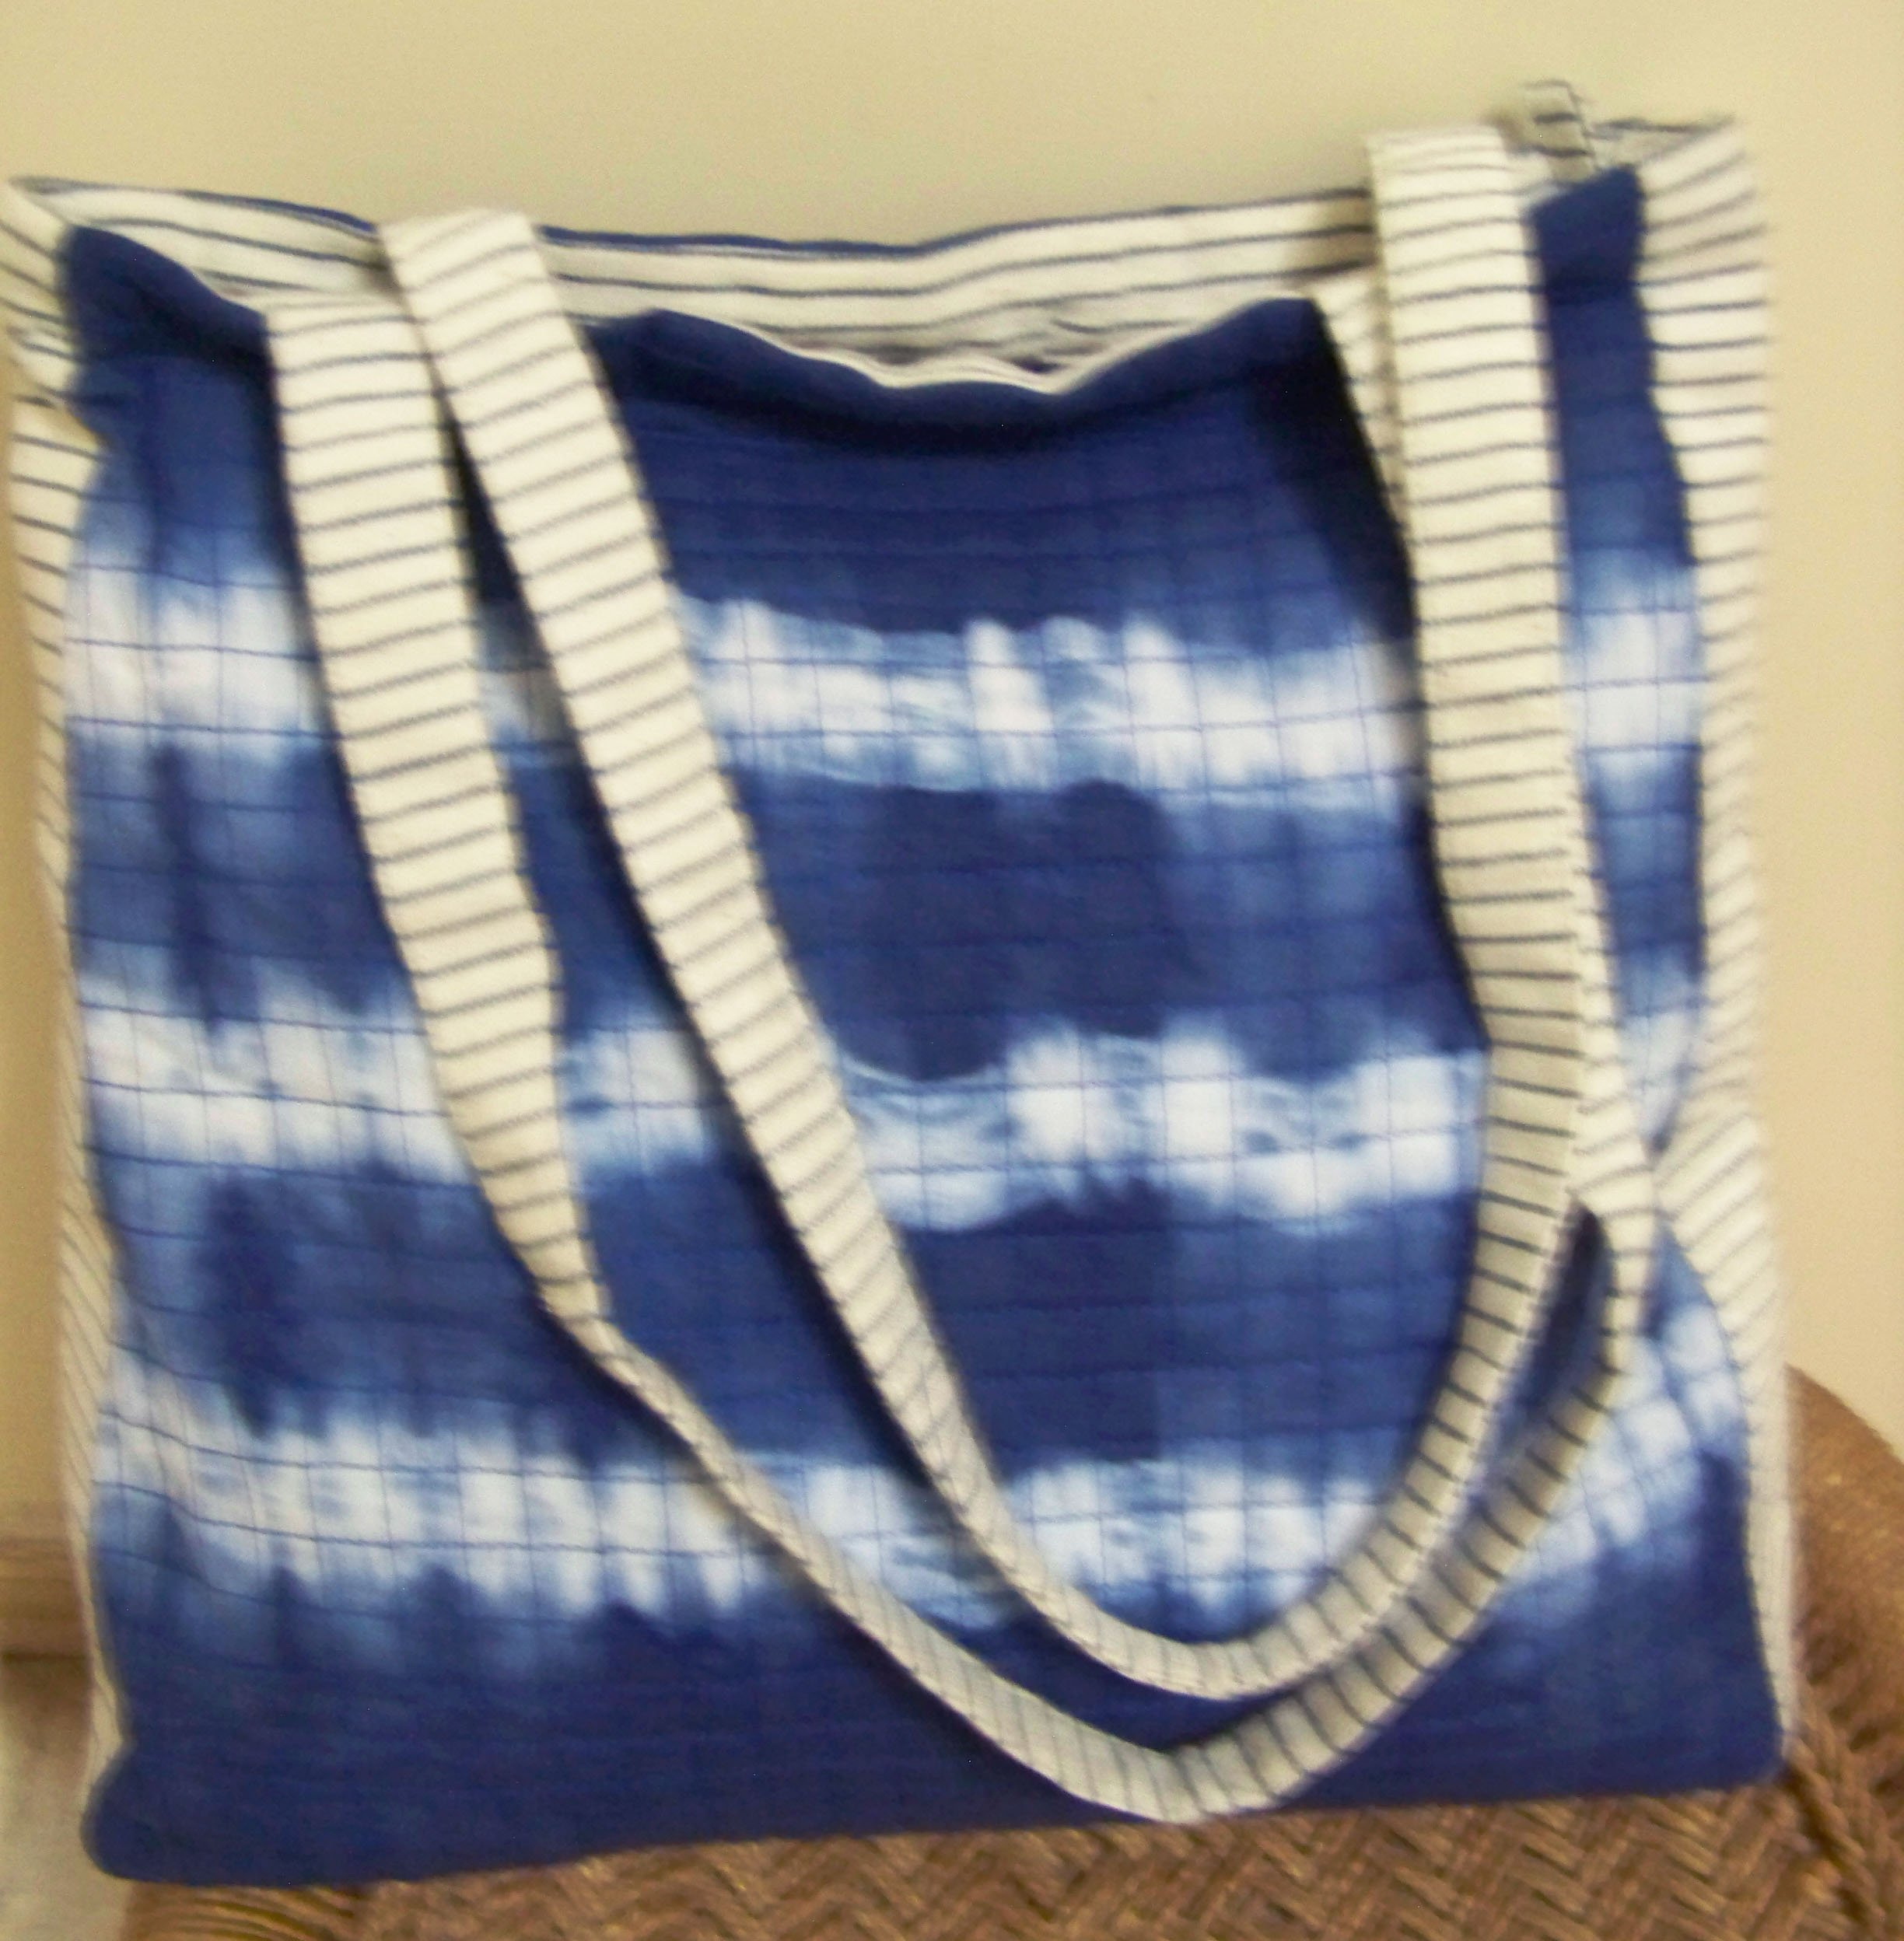 Panigha India Handmade Top Handle/Tote Bag made of cotton fabric with Tie n Dye in Indigo Blue - handmade-bags